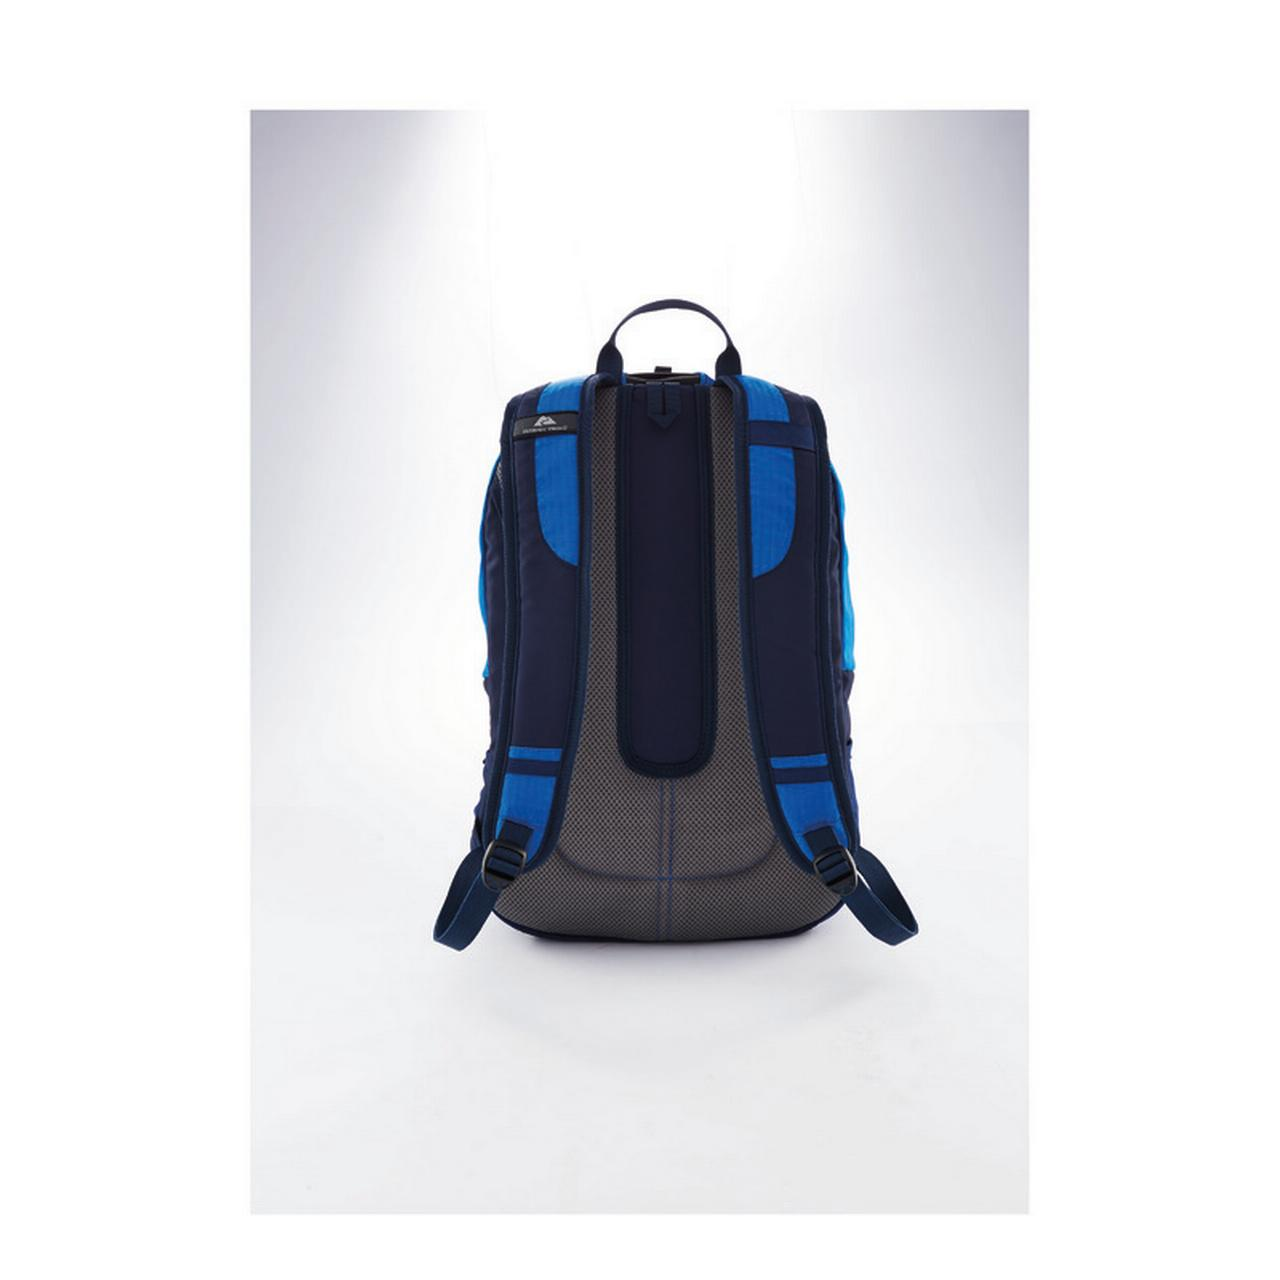 Ozark Trail 25 L Stillwater Hydration-Compatible Backpack